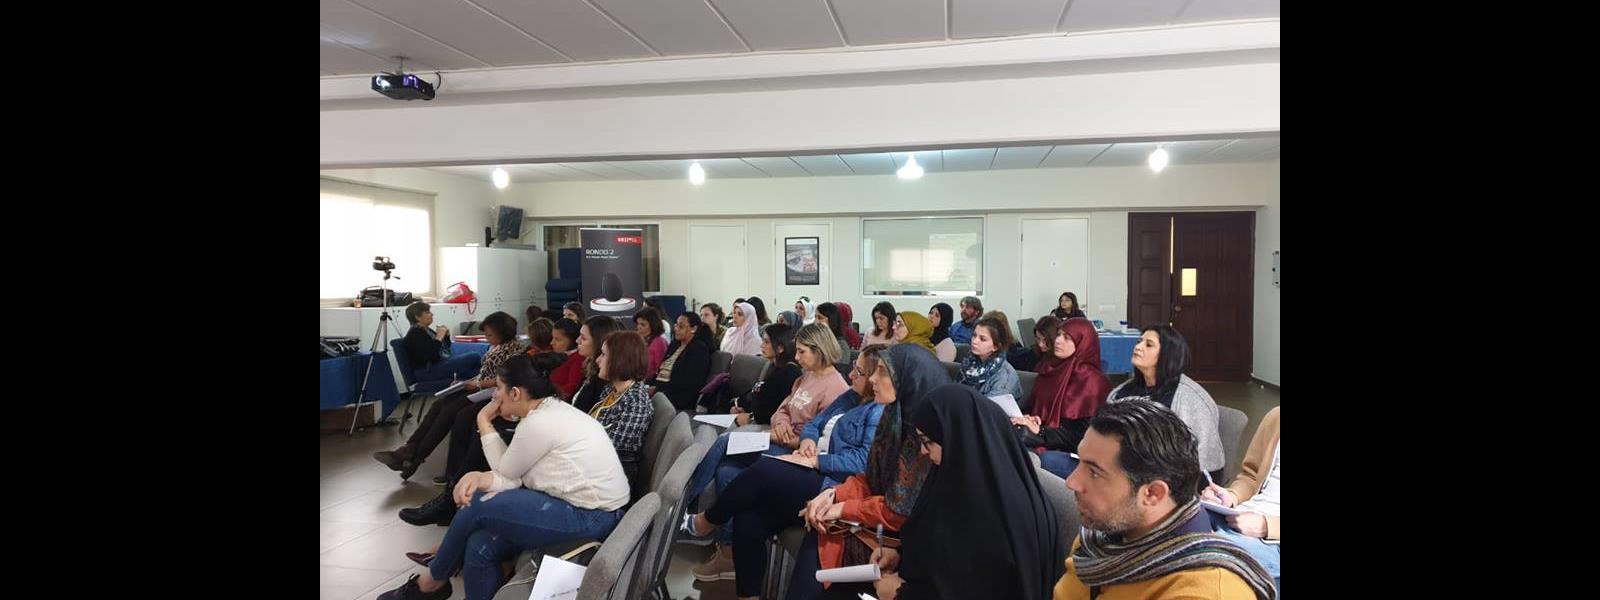 The Learning Center for The Deaf (LCD) | News | Training Program for